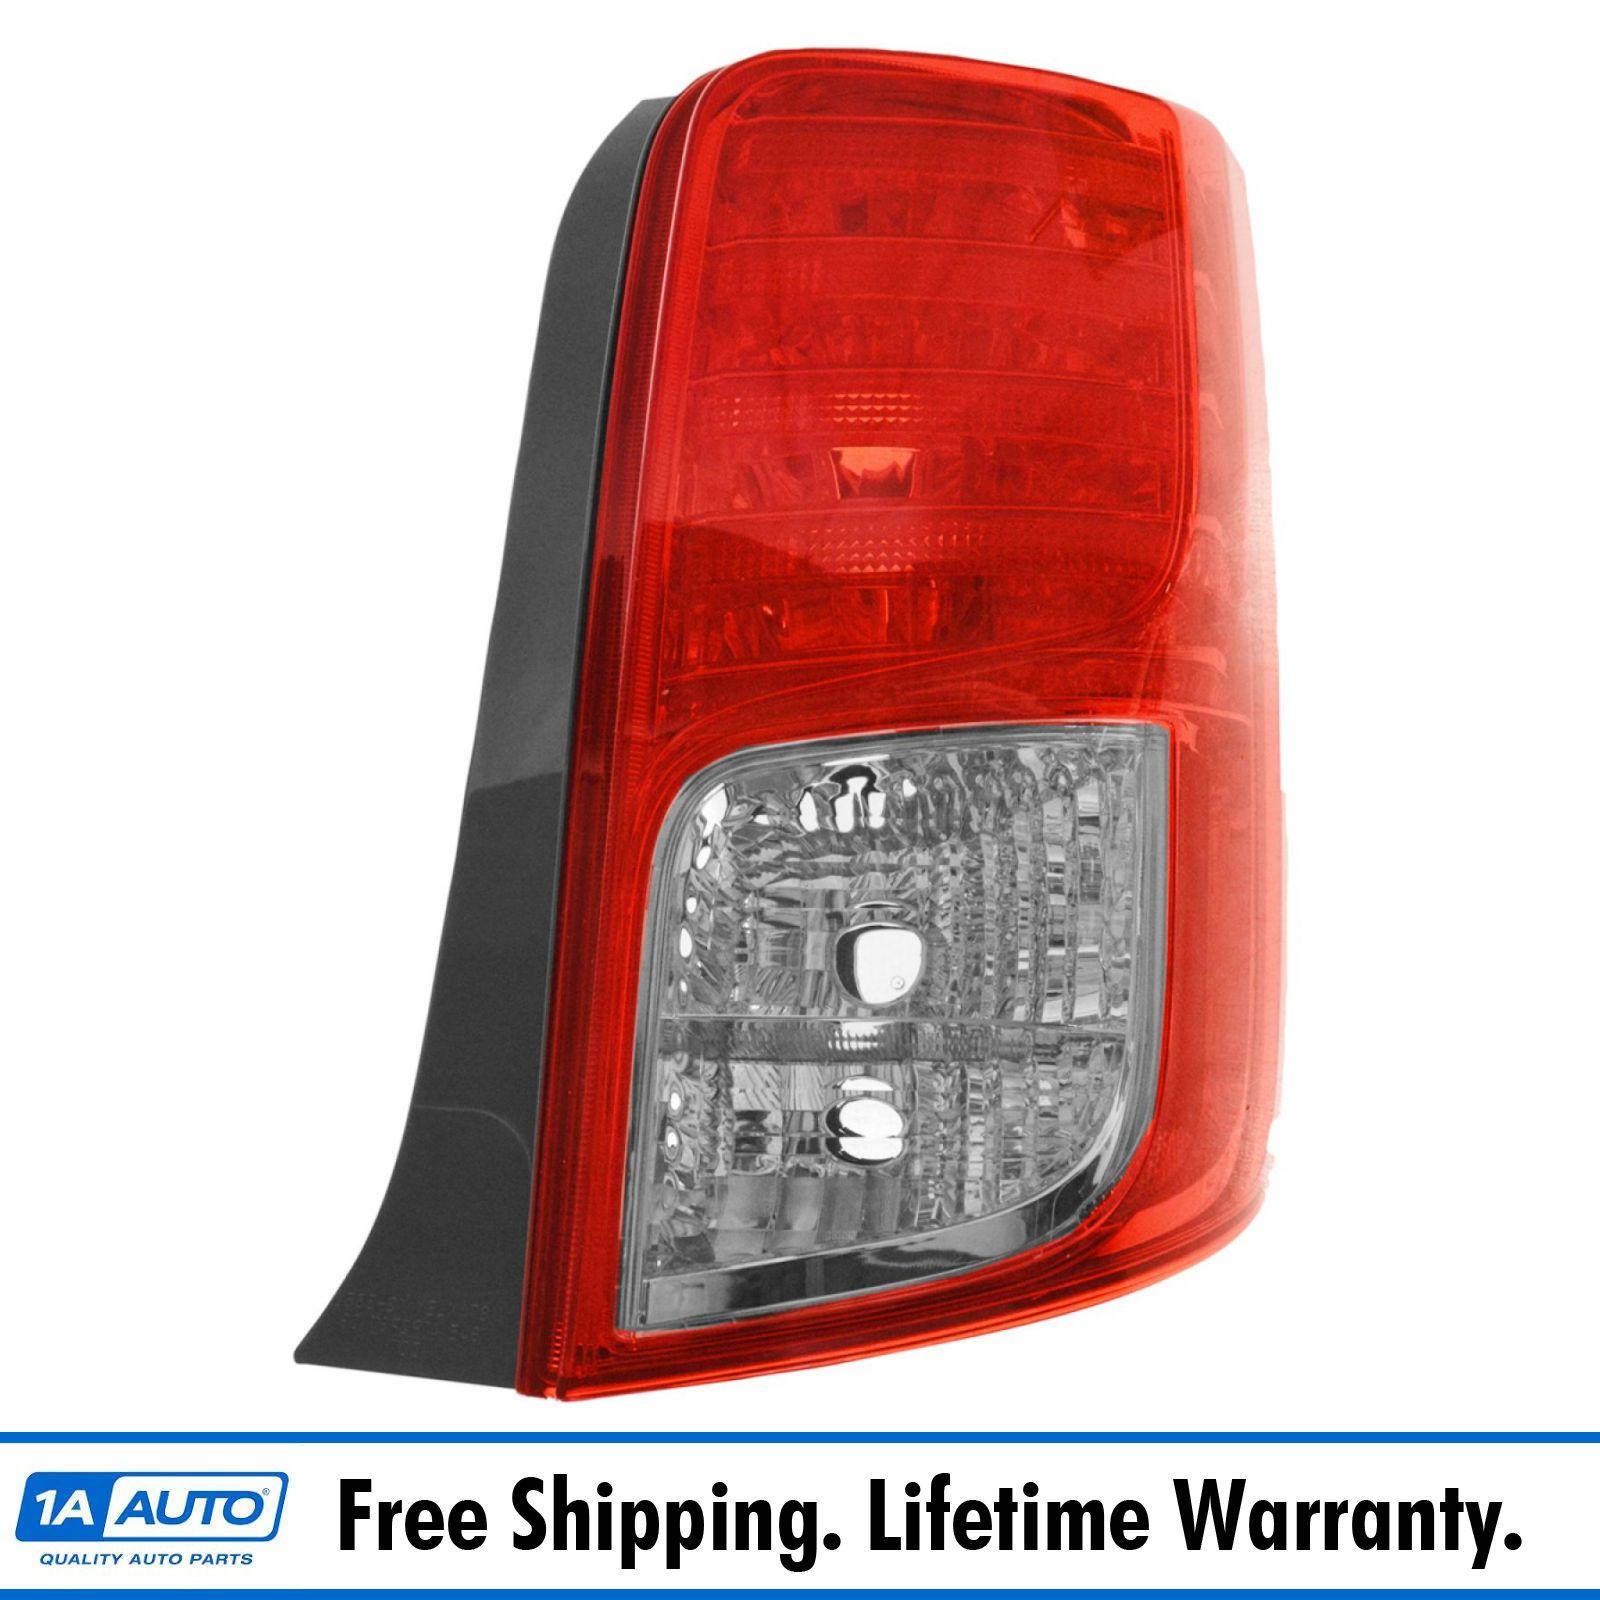 08-10 Scion XB X B Taillight Taillamp Rear Brake Light Lamp Right Passenger Side